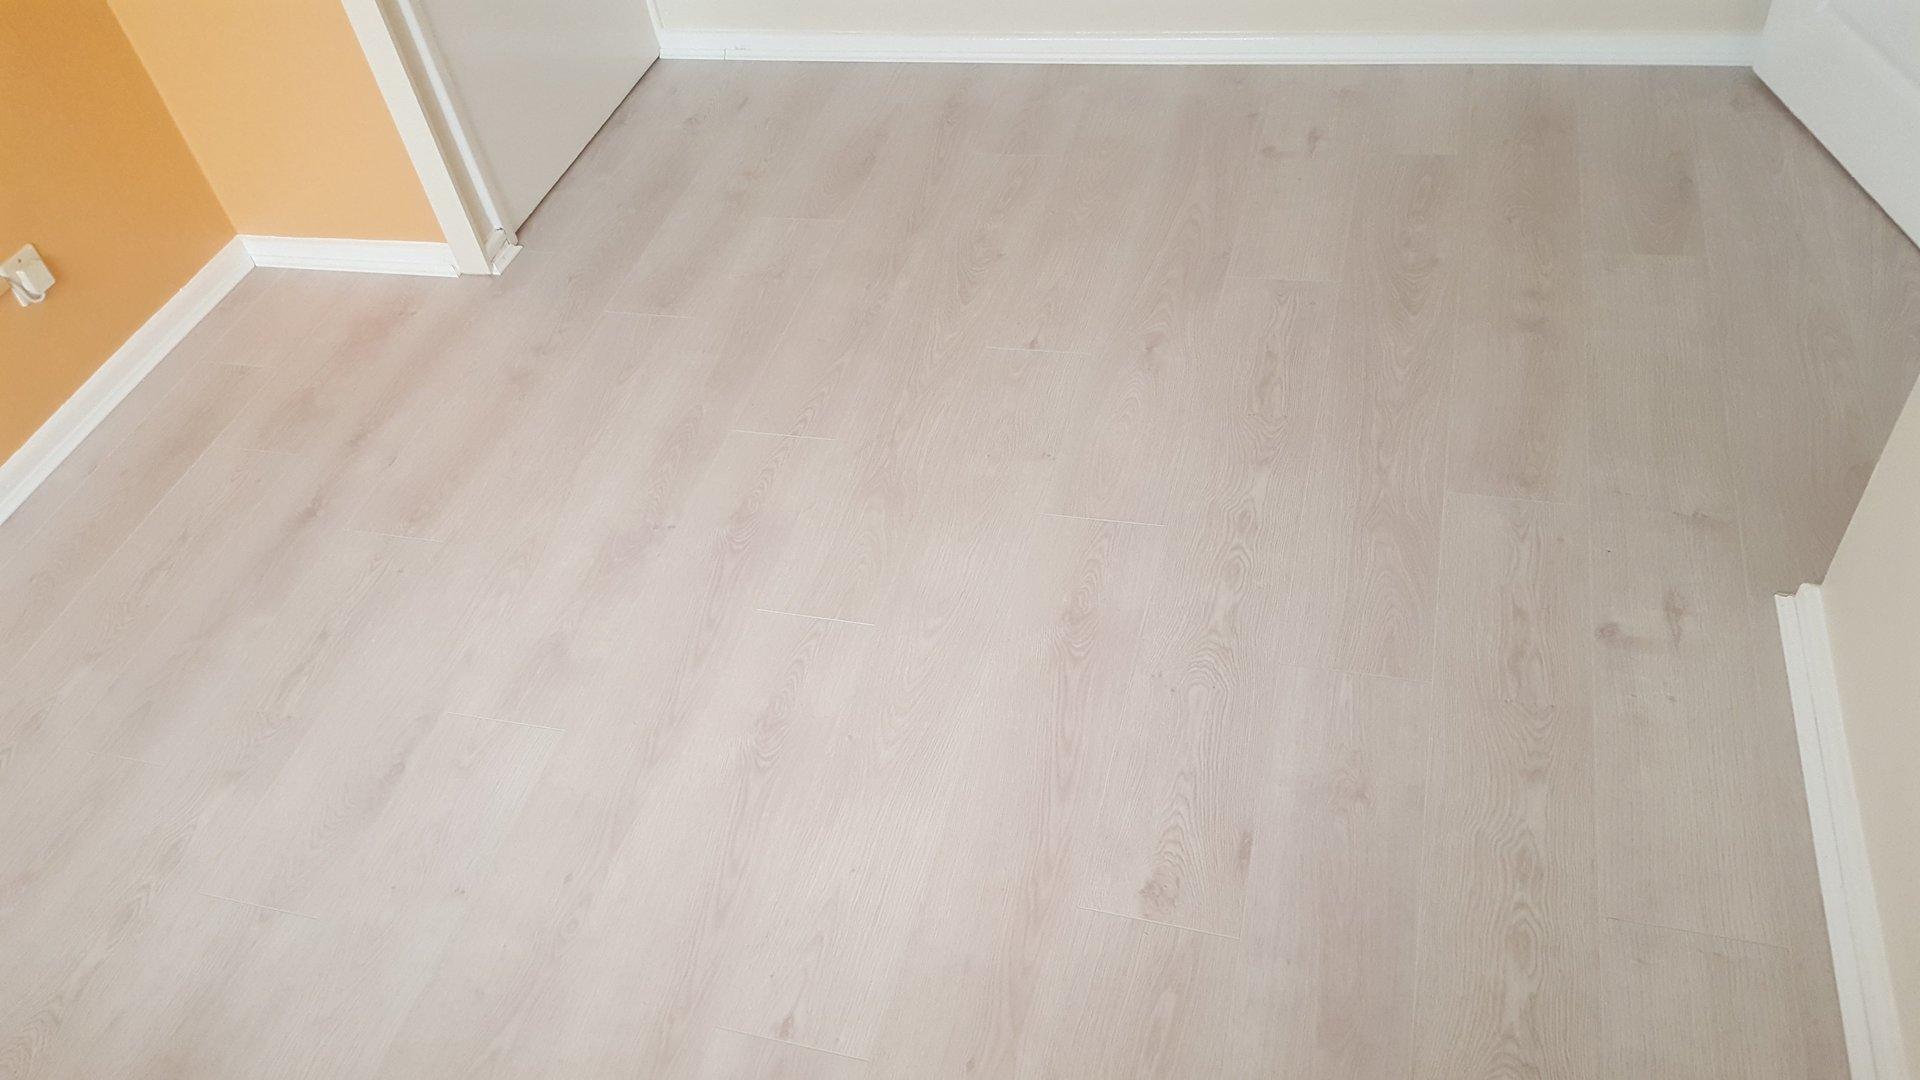 Kitchen Floor Wood Effect Vinyl Flooring Installed